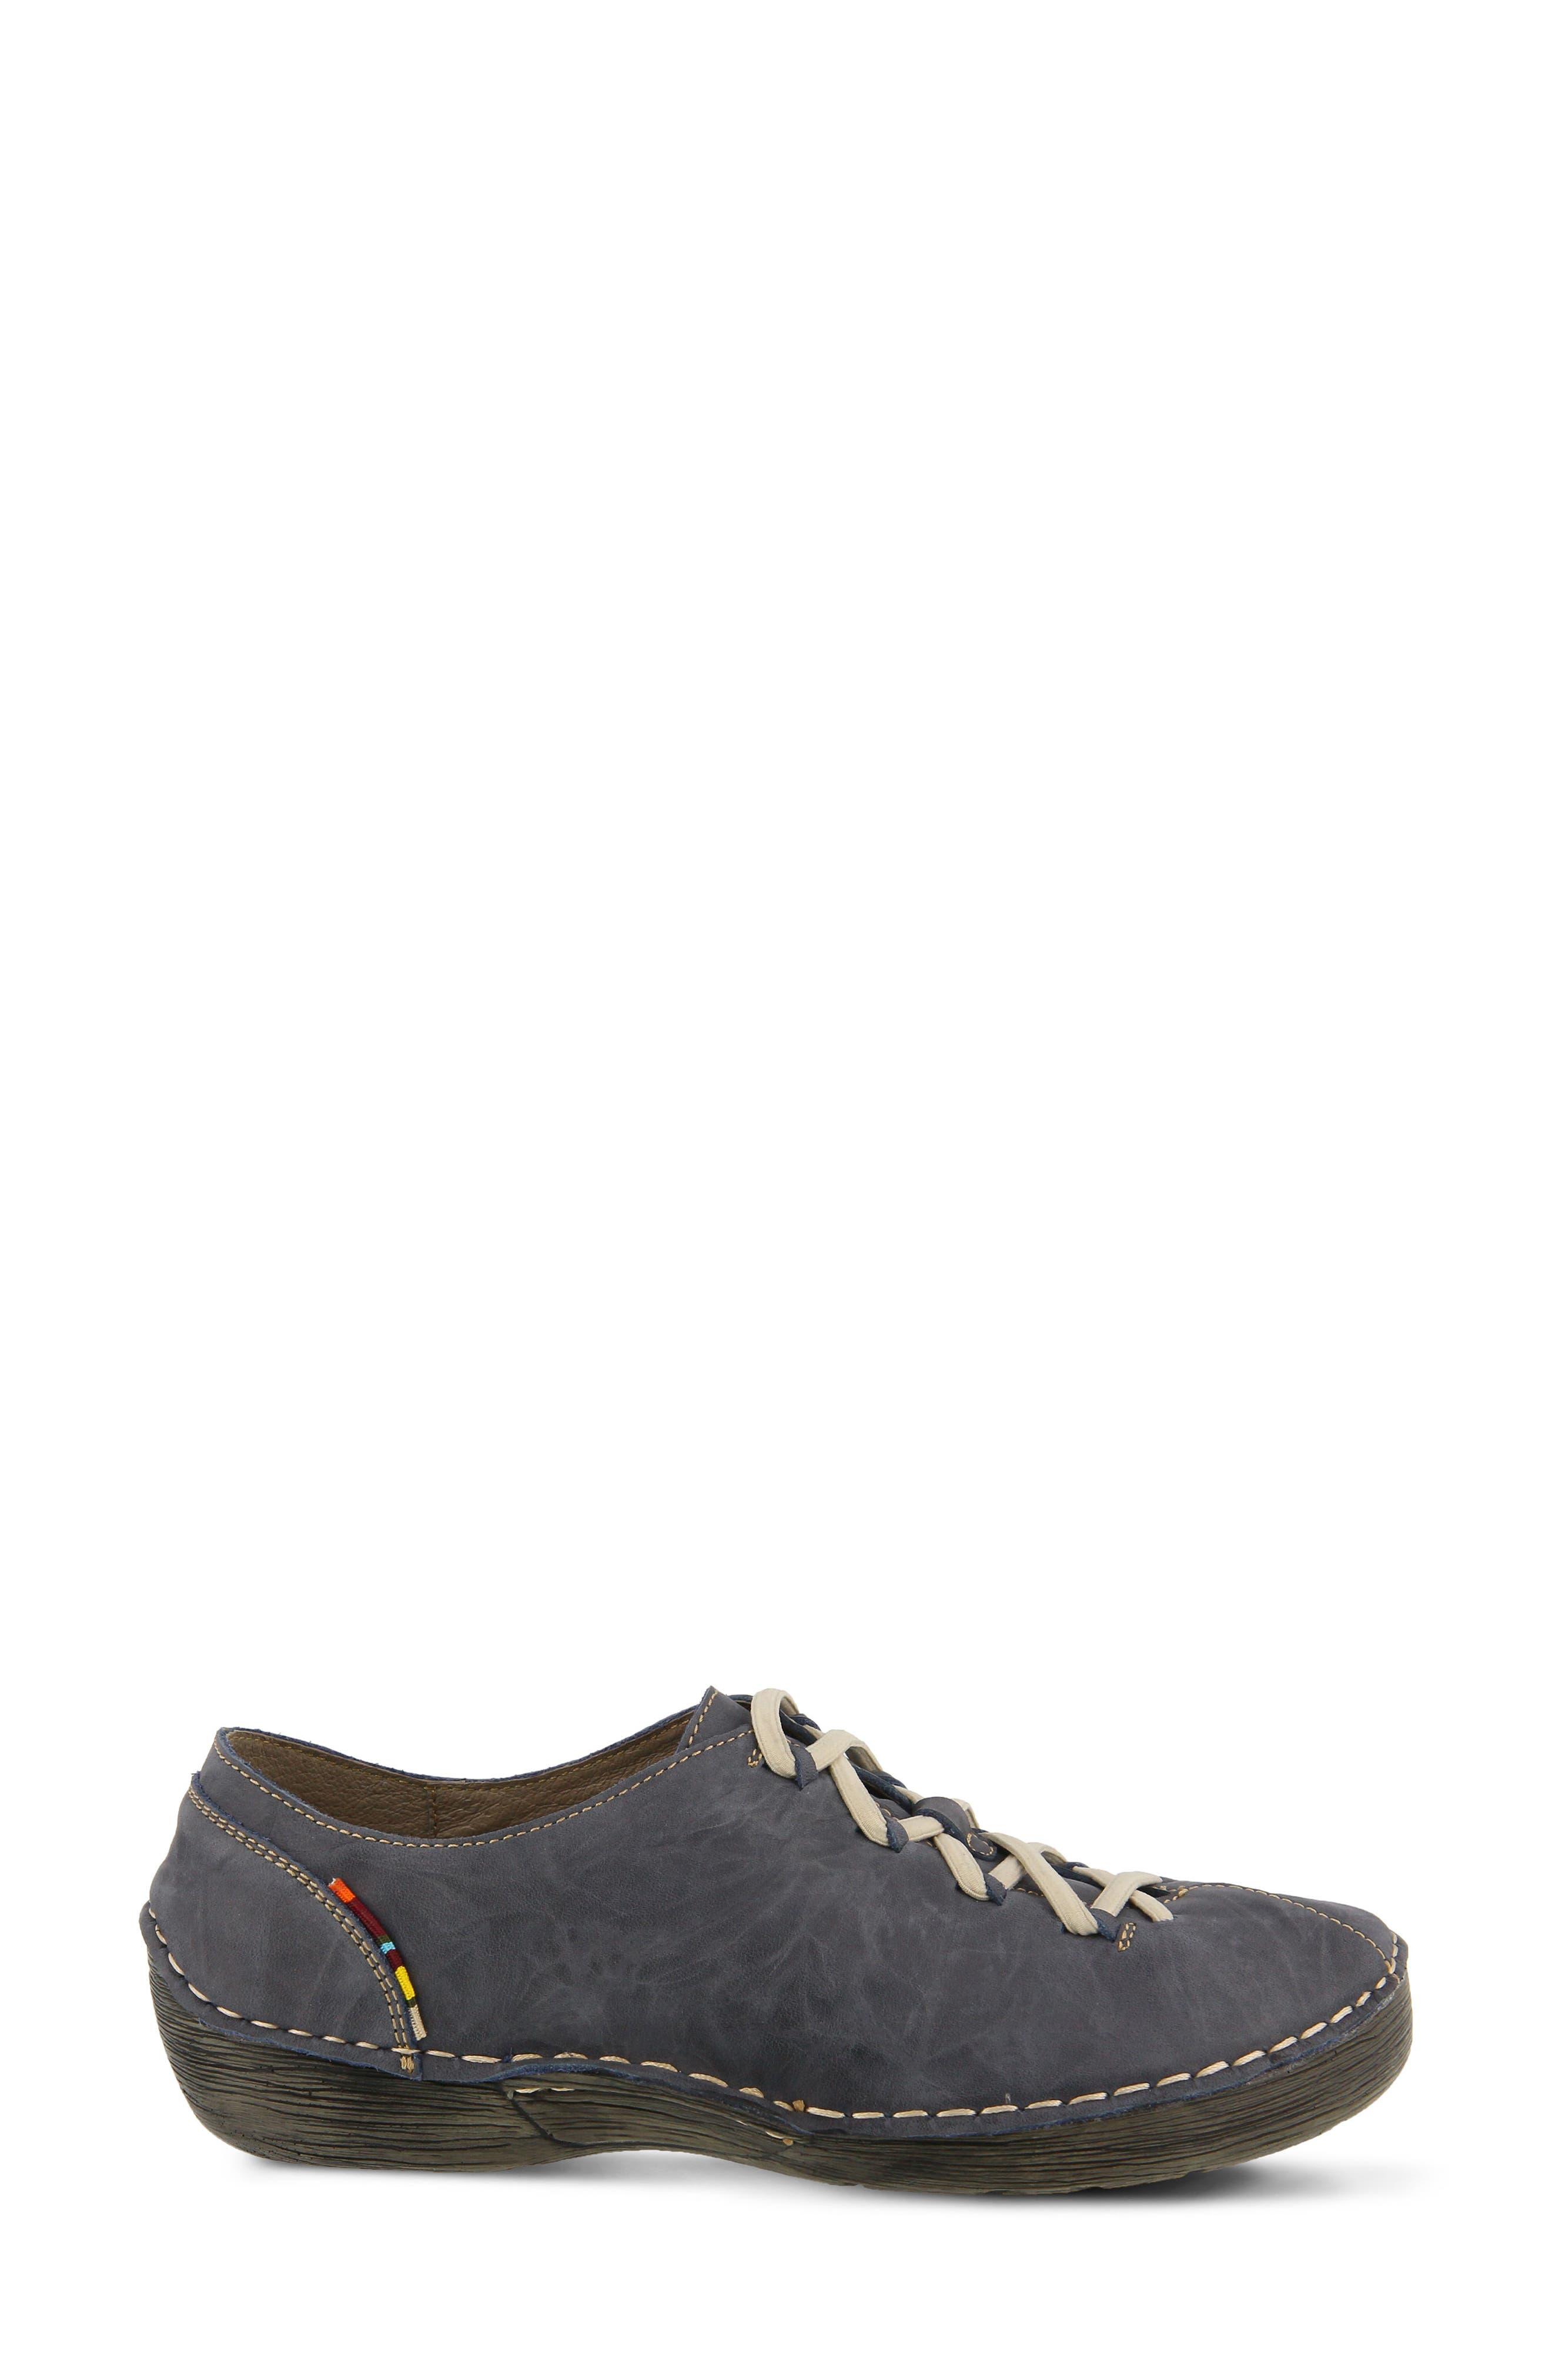 Carhop Sneaker,                             Alternate thumbnail 3, color,                             Blue Leather